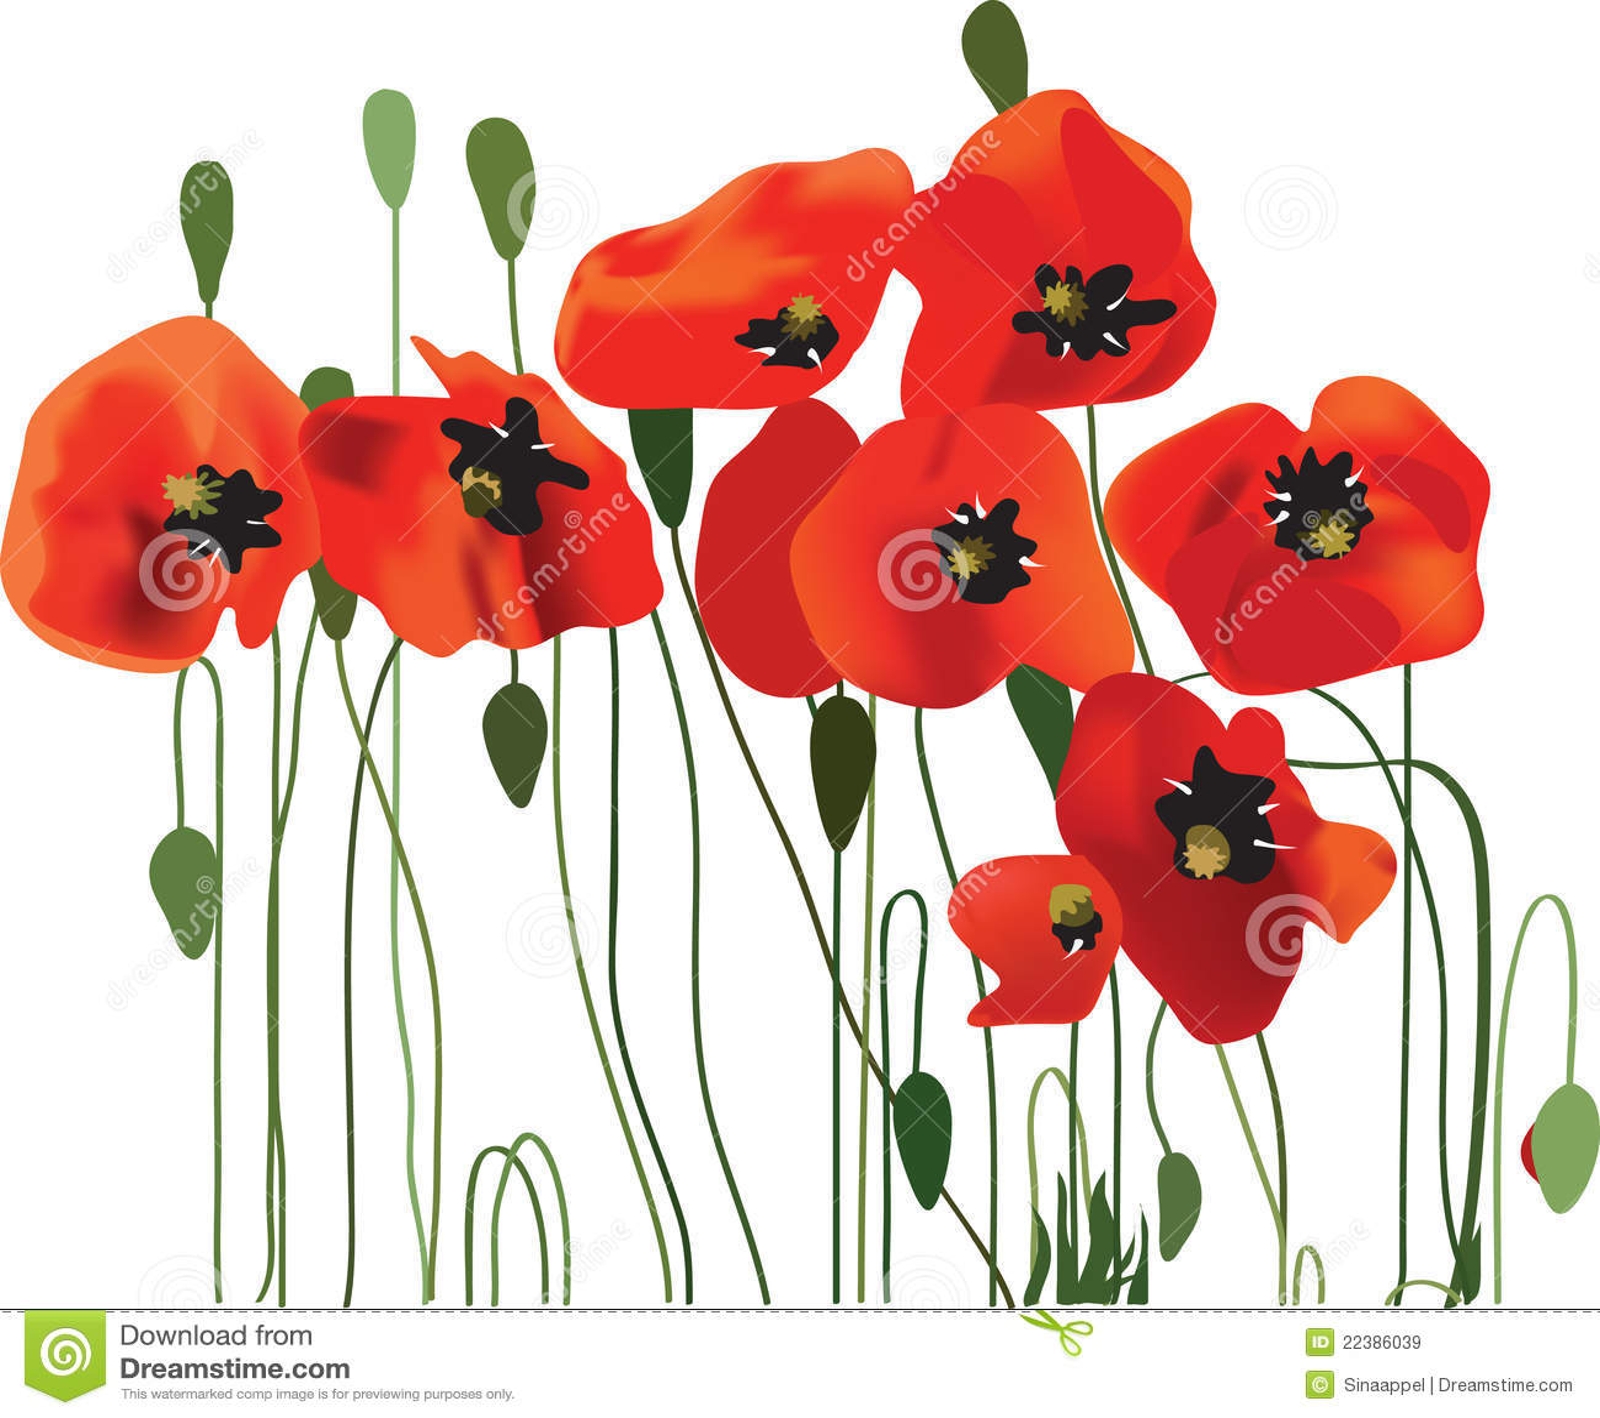 Poppy background flower art stock vector illustration of card download comp mightylinksfo